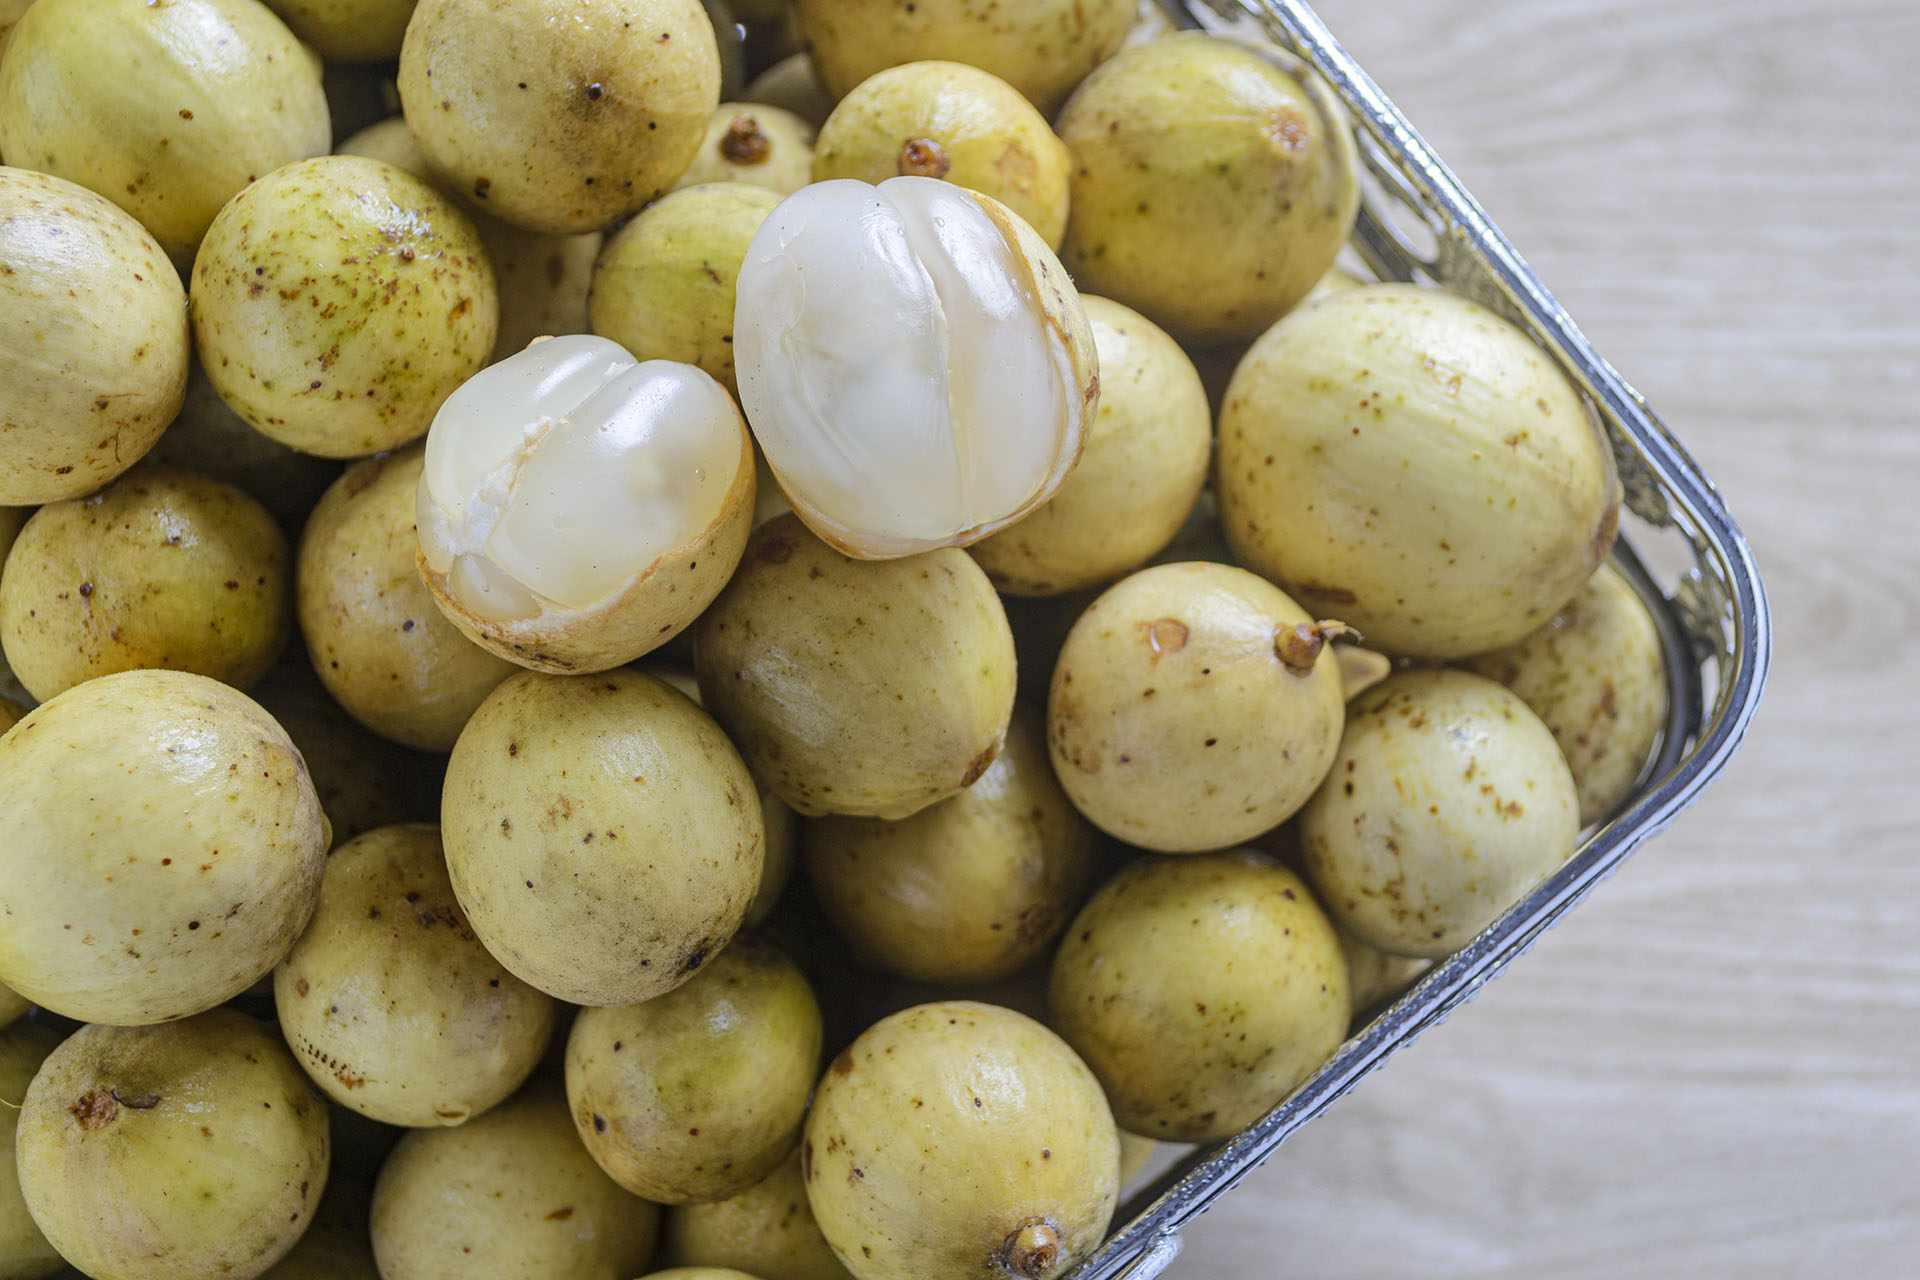 Lanzones (langsat) fruit